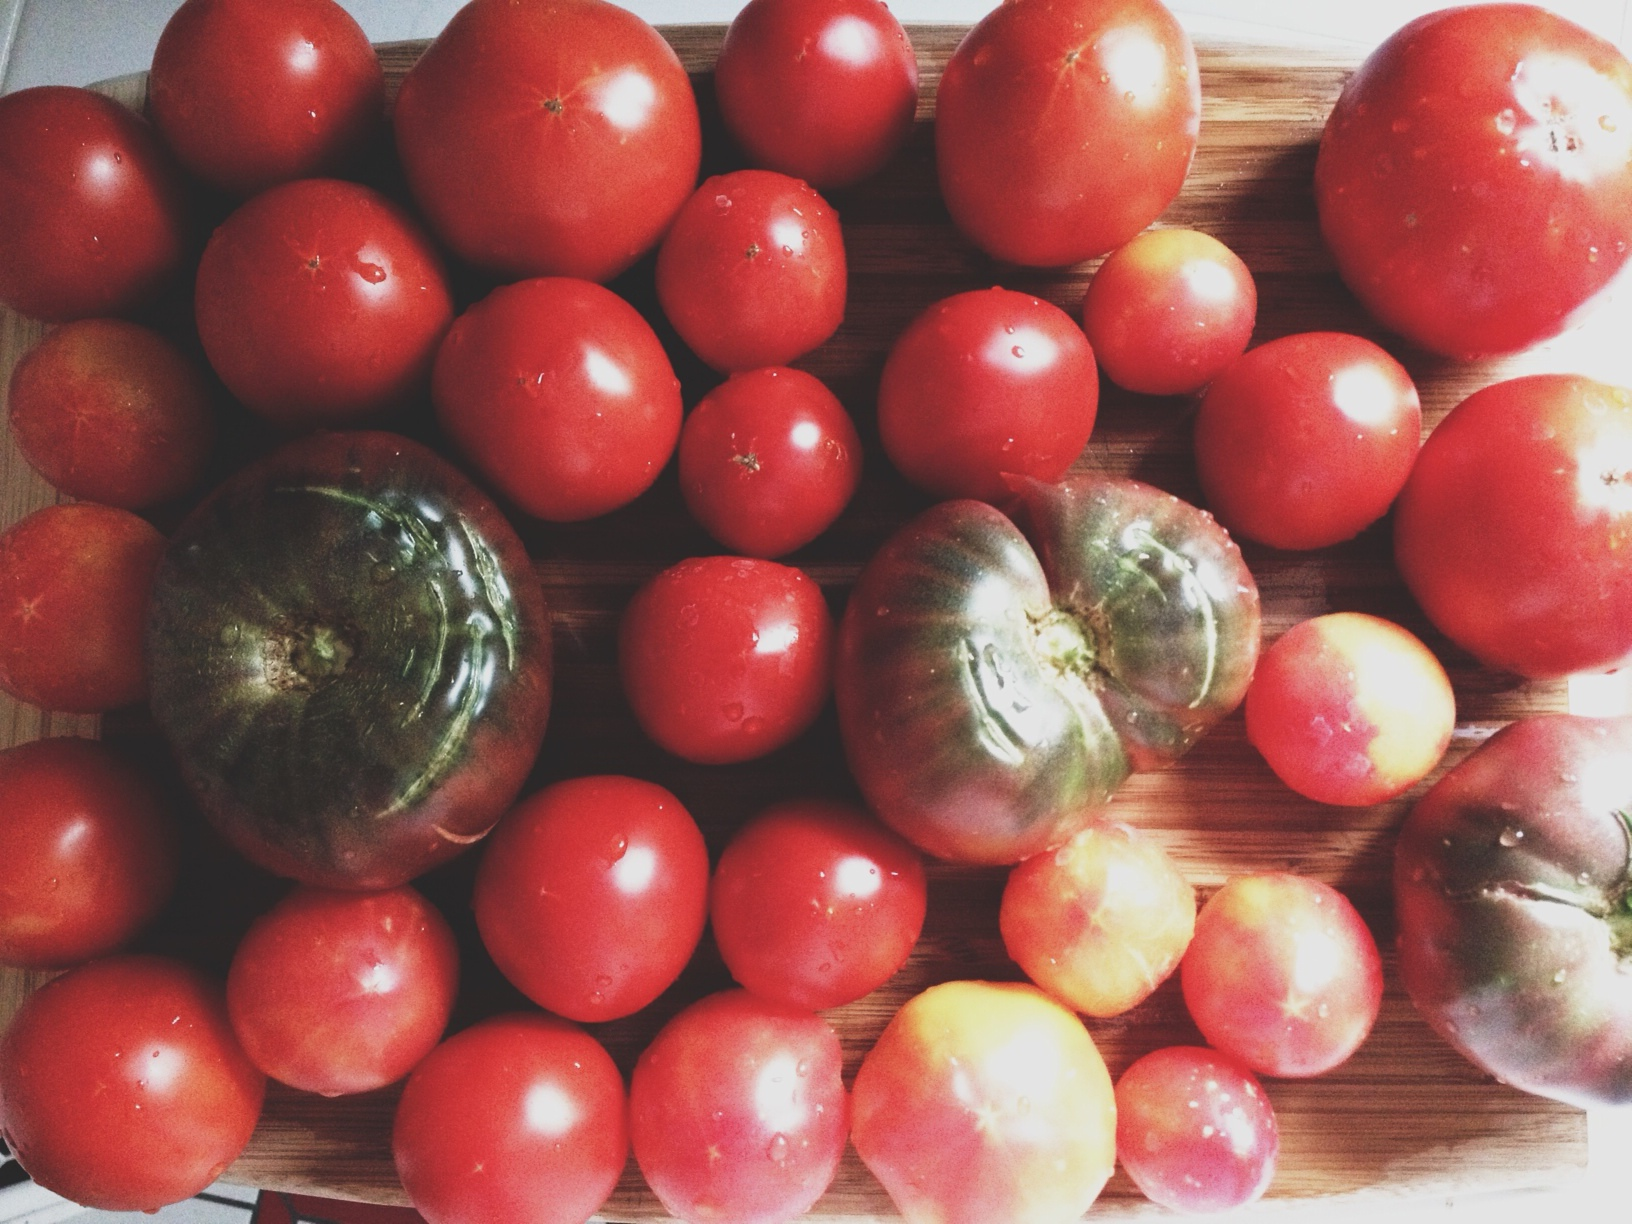 tomato10.jpg